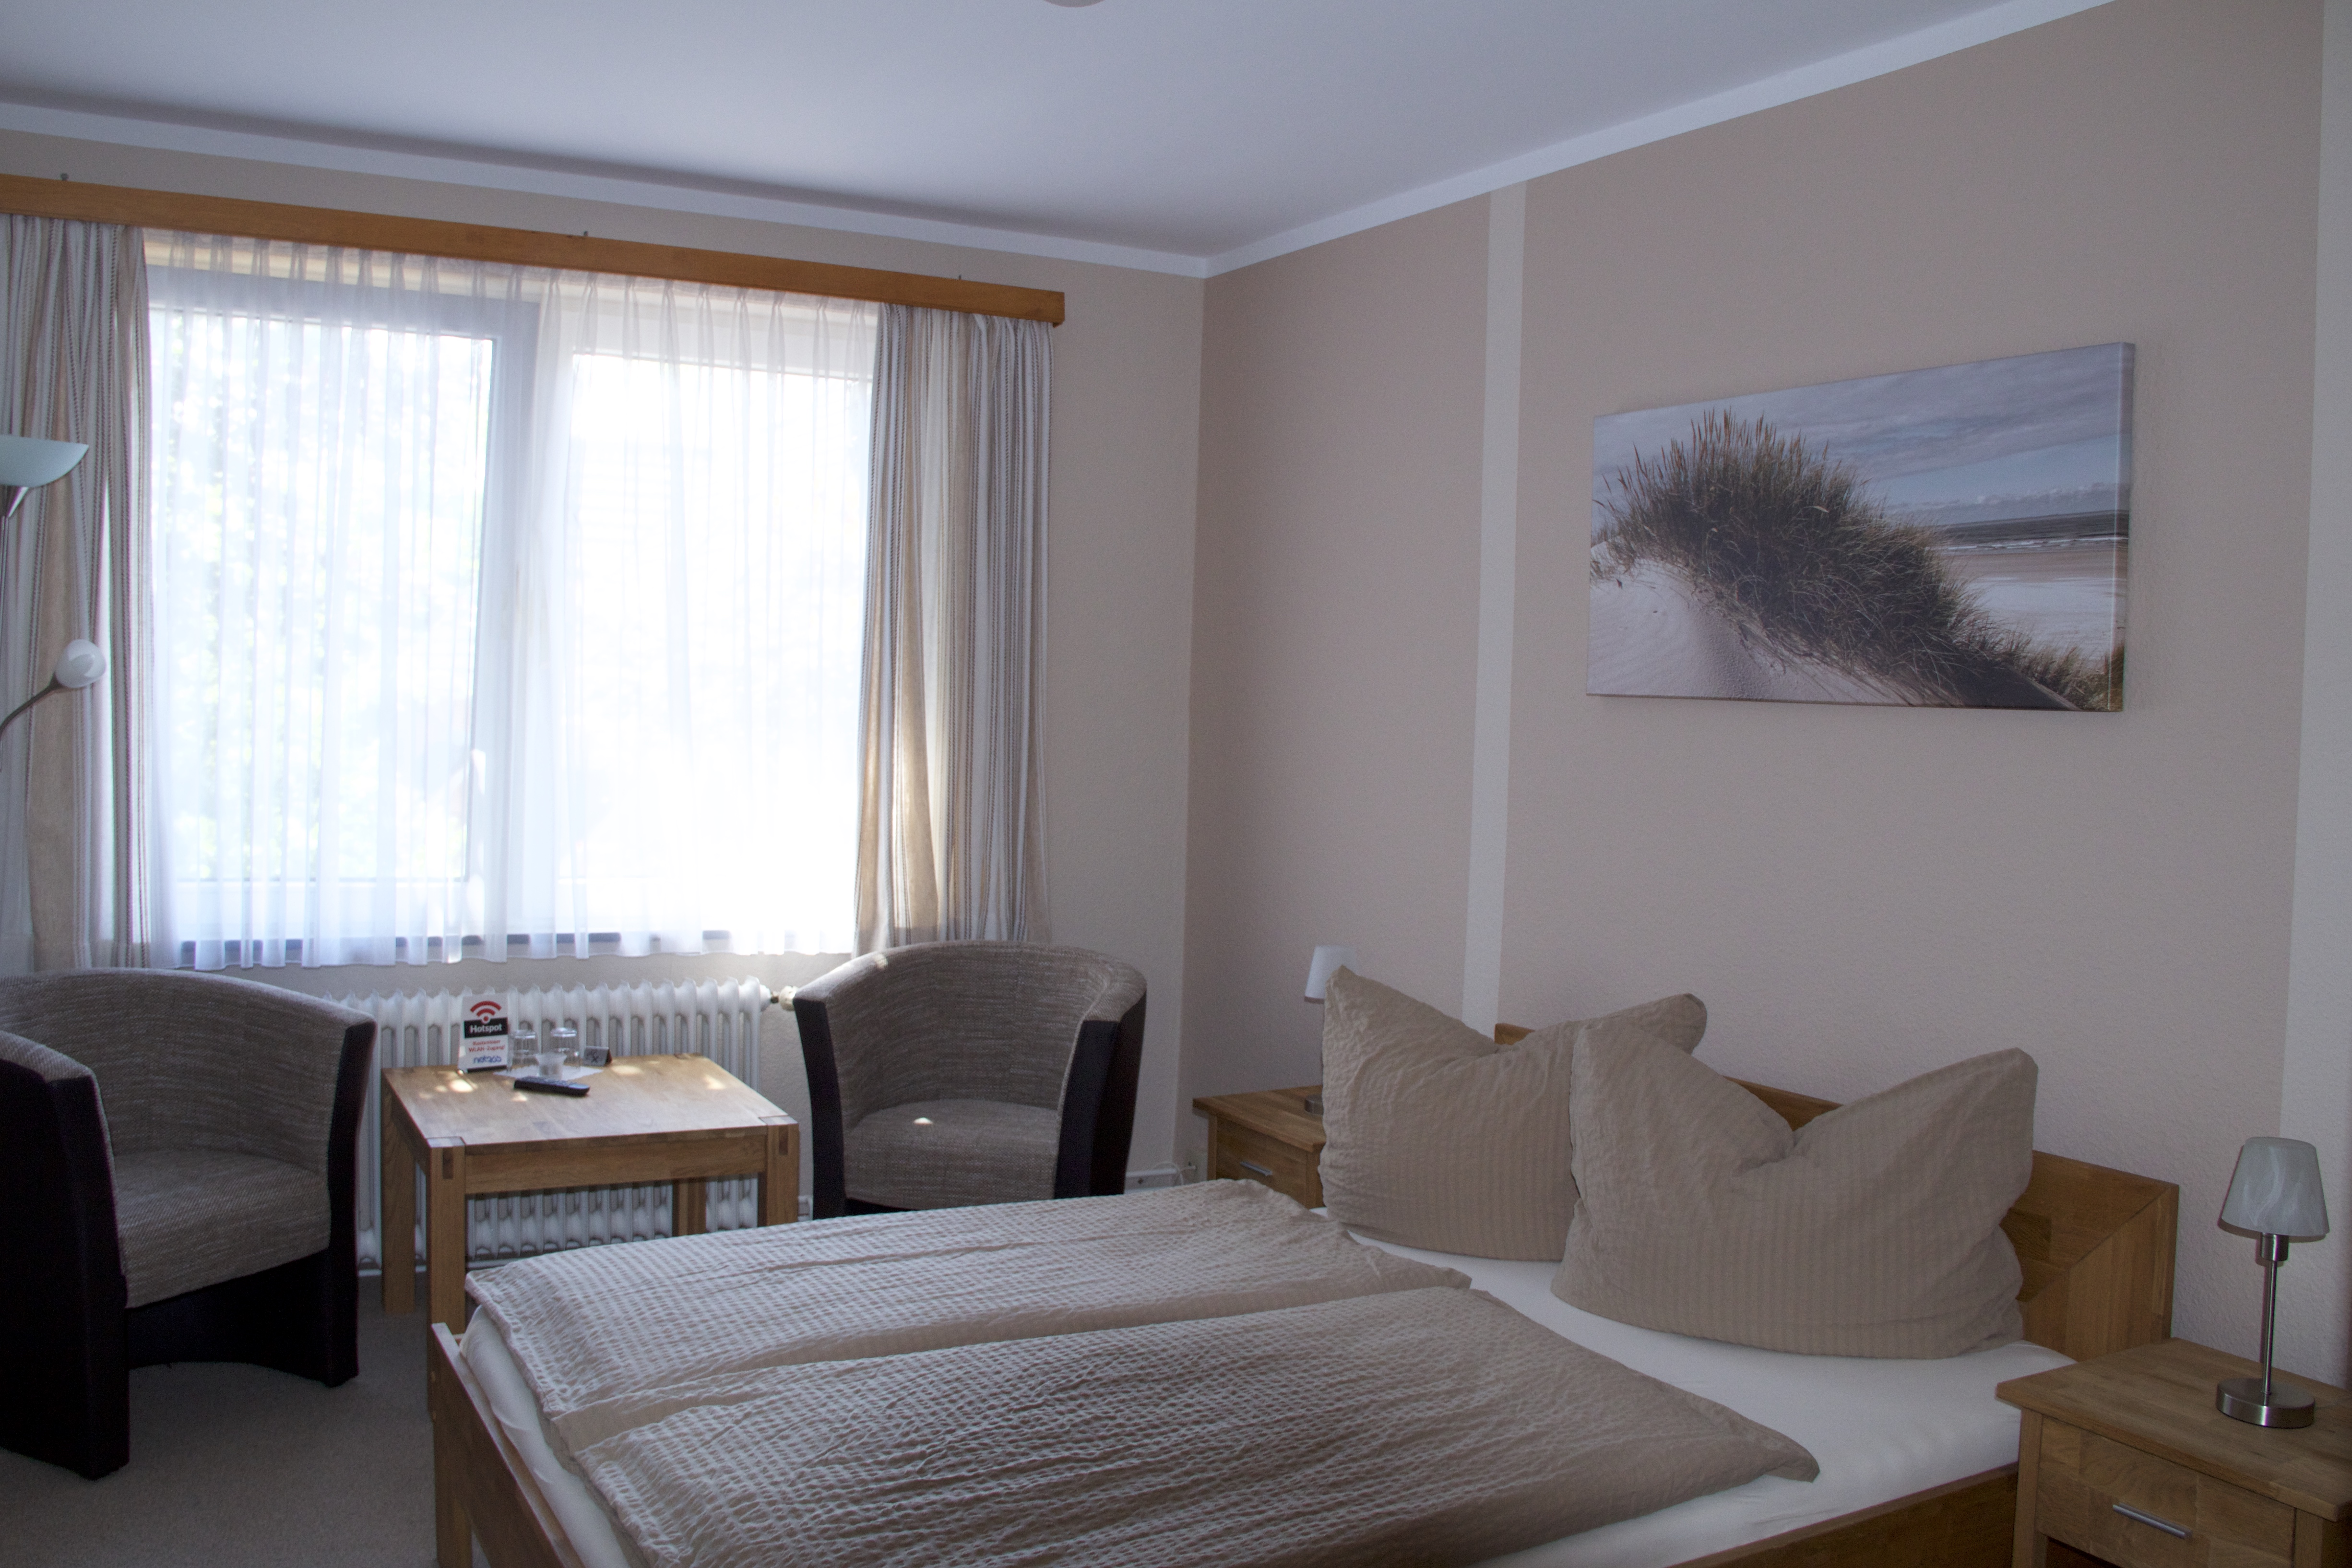 Hotel Zum Wikinger St Peter Ording